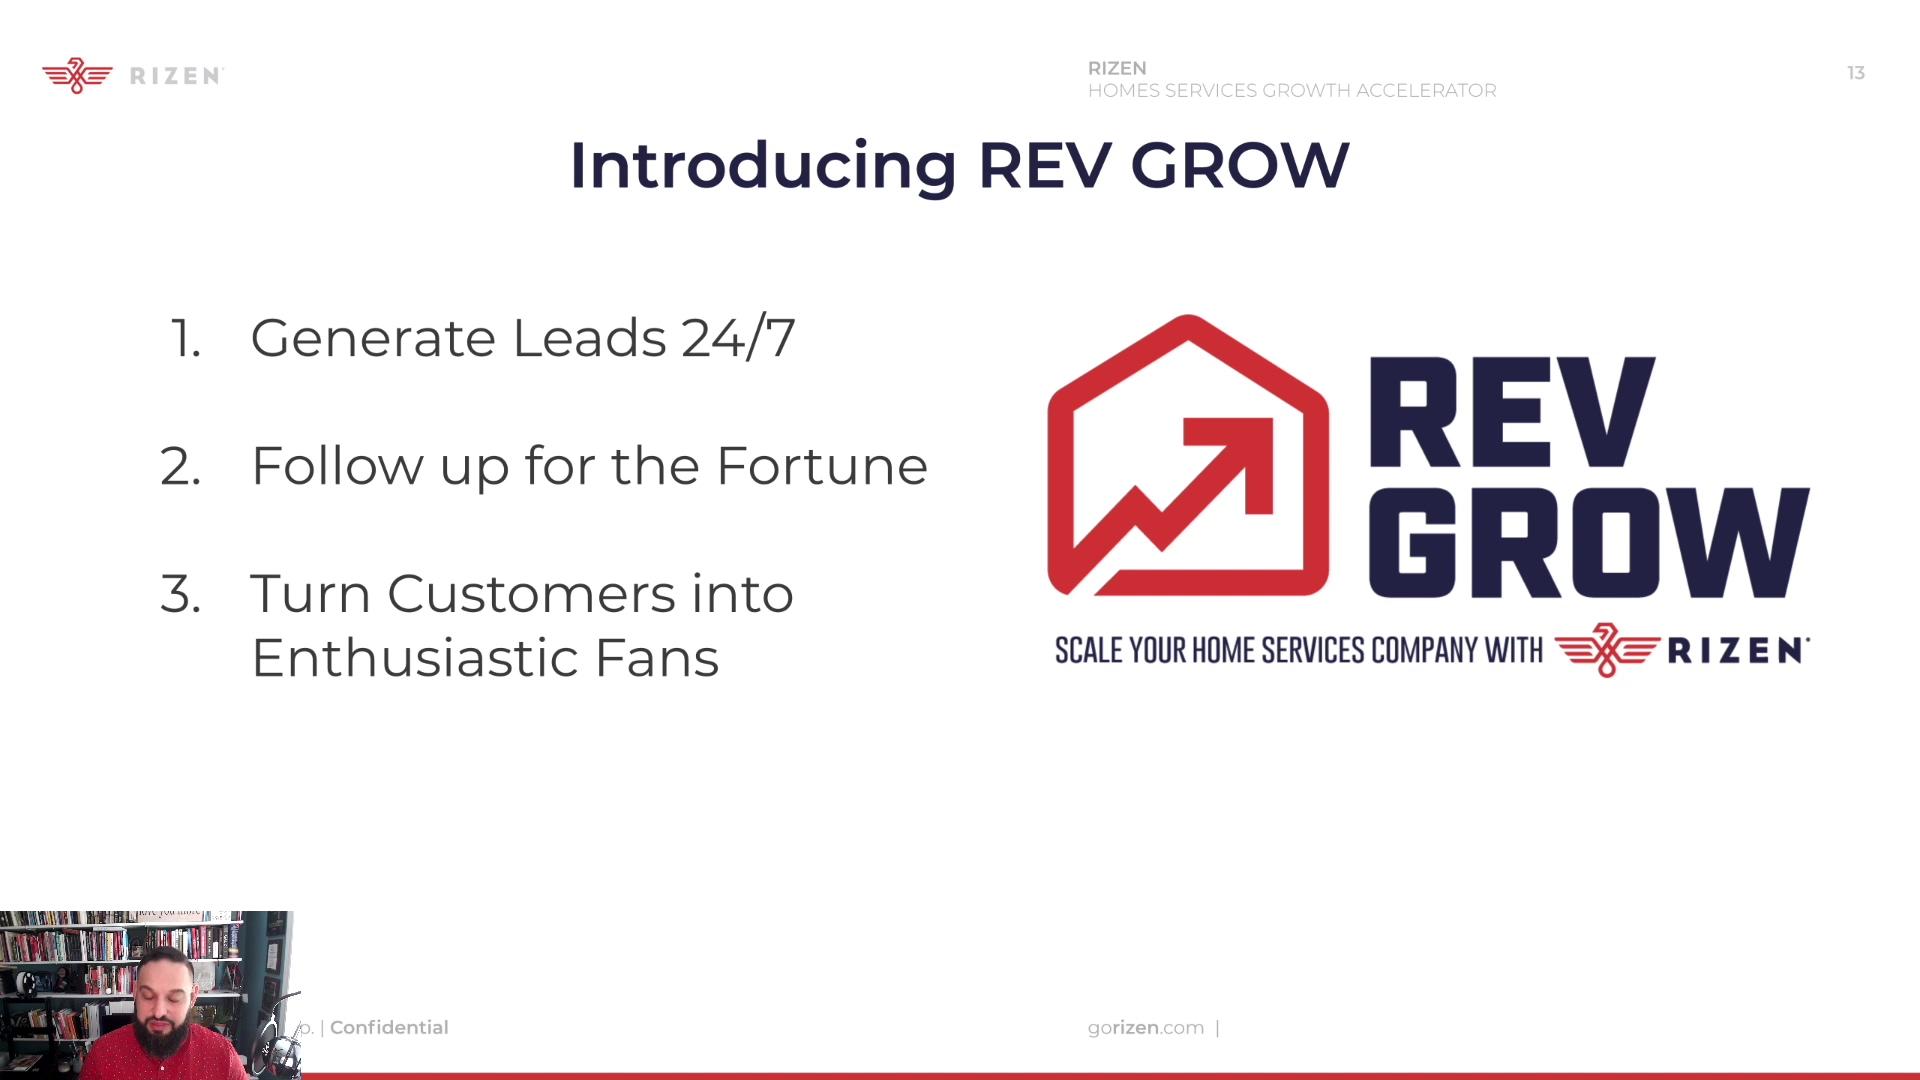 Rev Grow Overview (Rod)